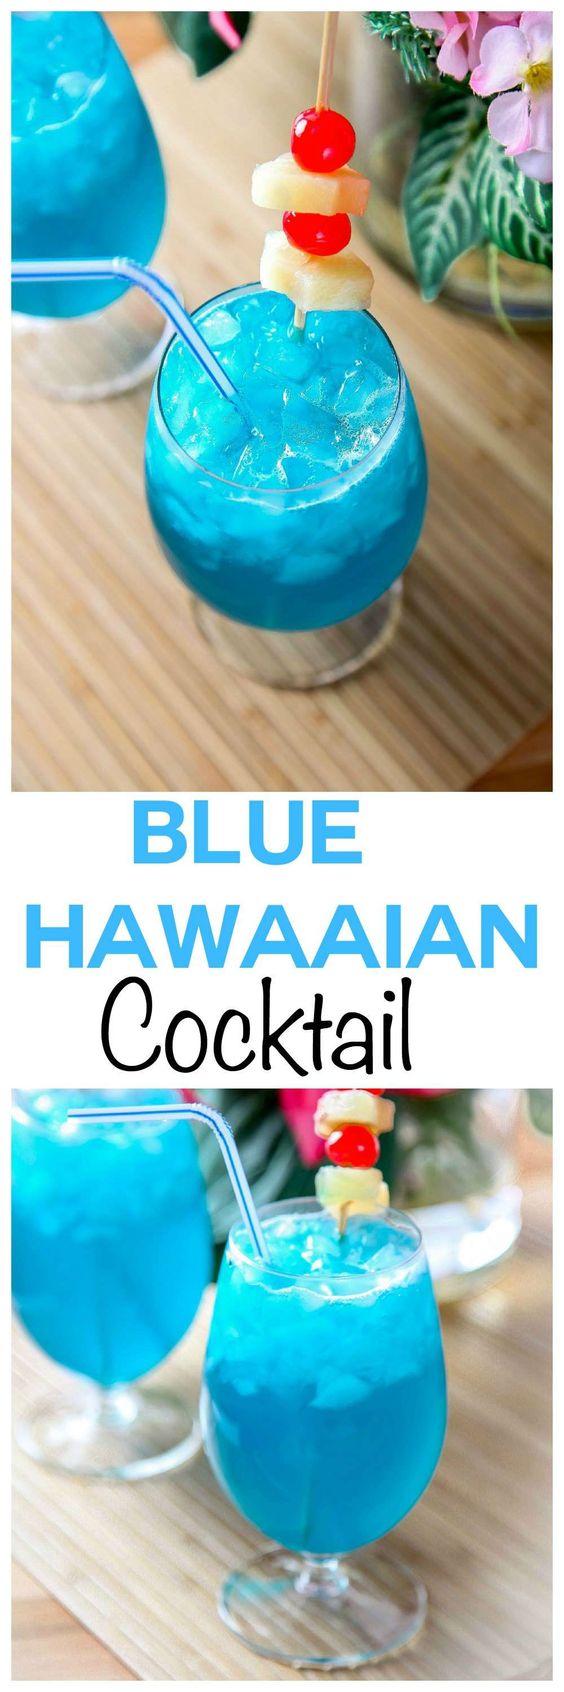 Hawaiian Recipes, Pirates And It Is